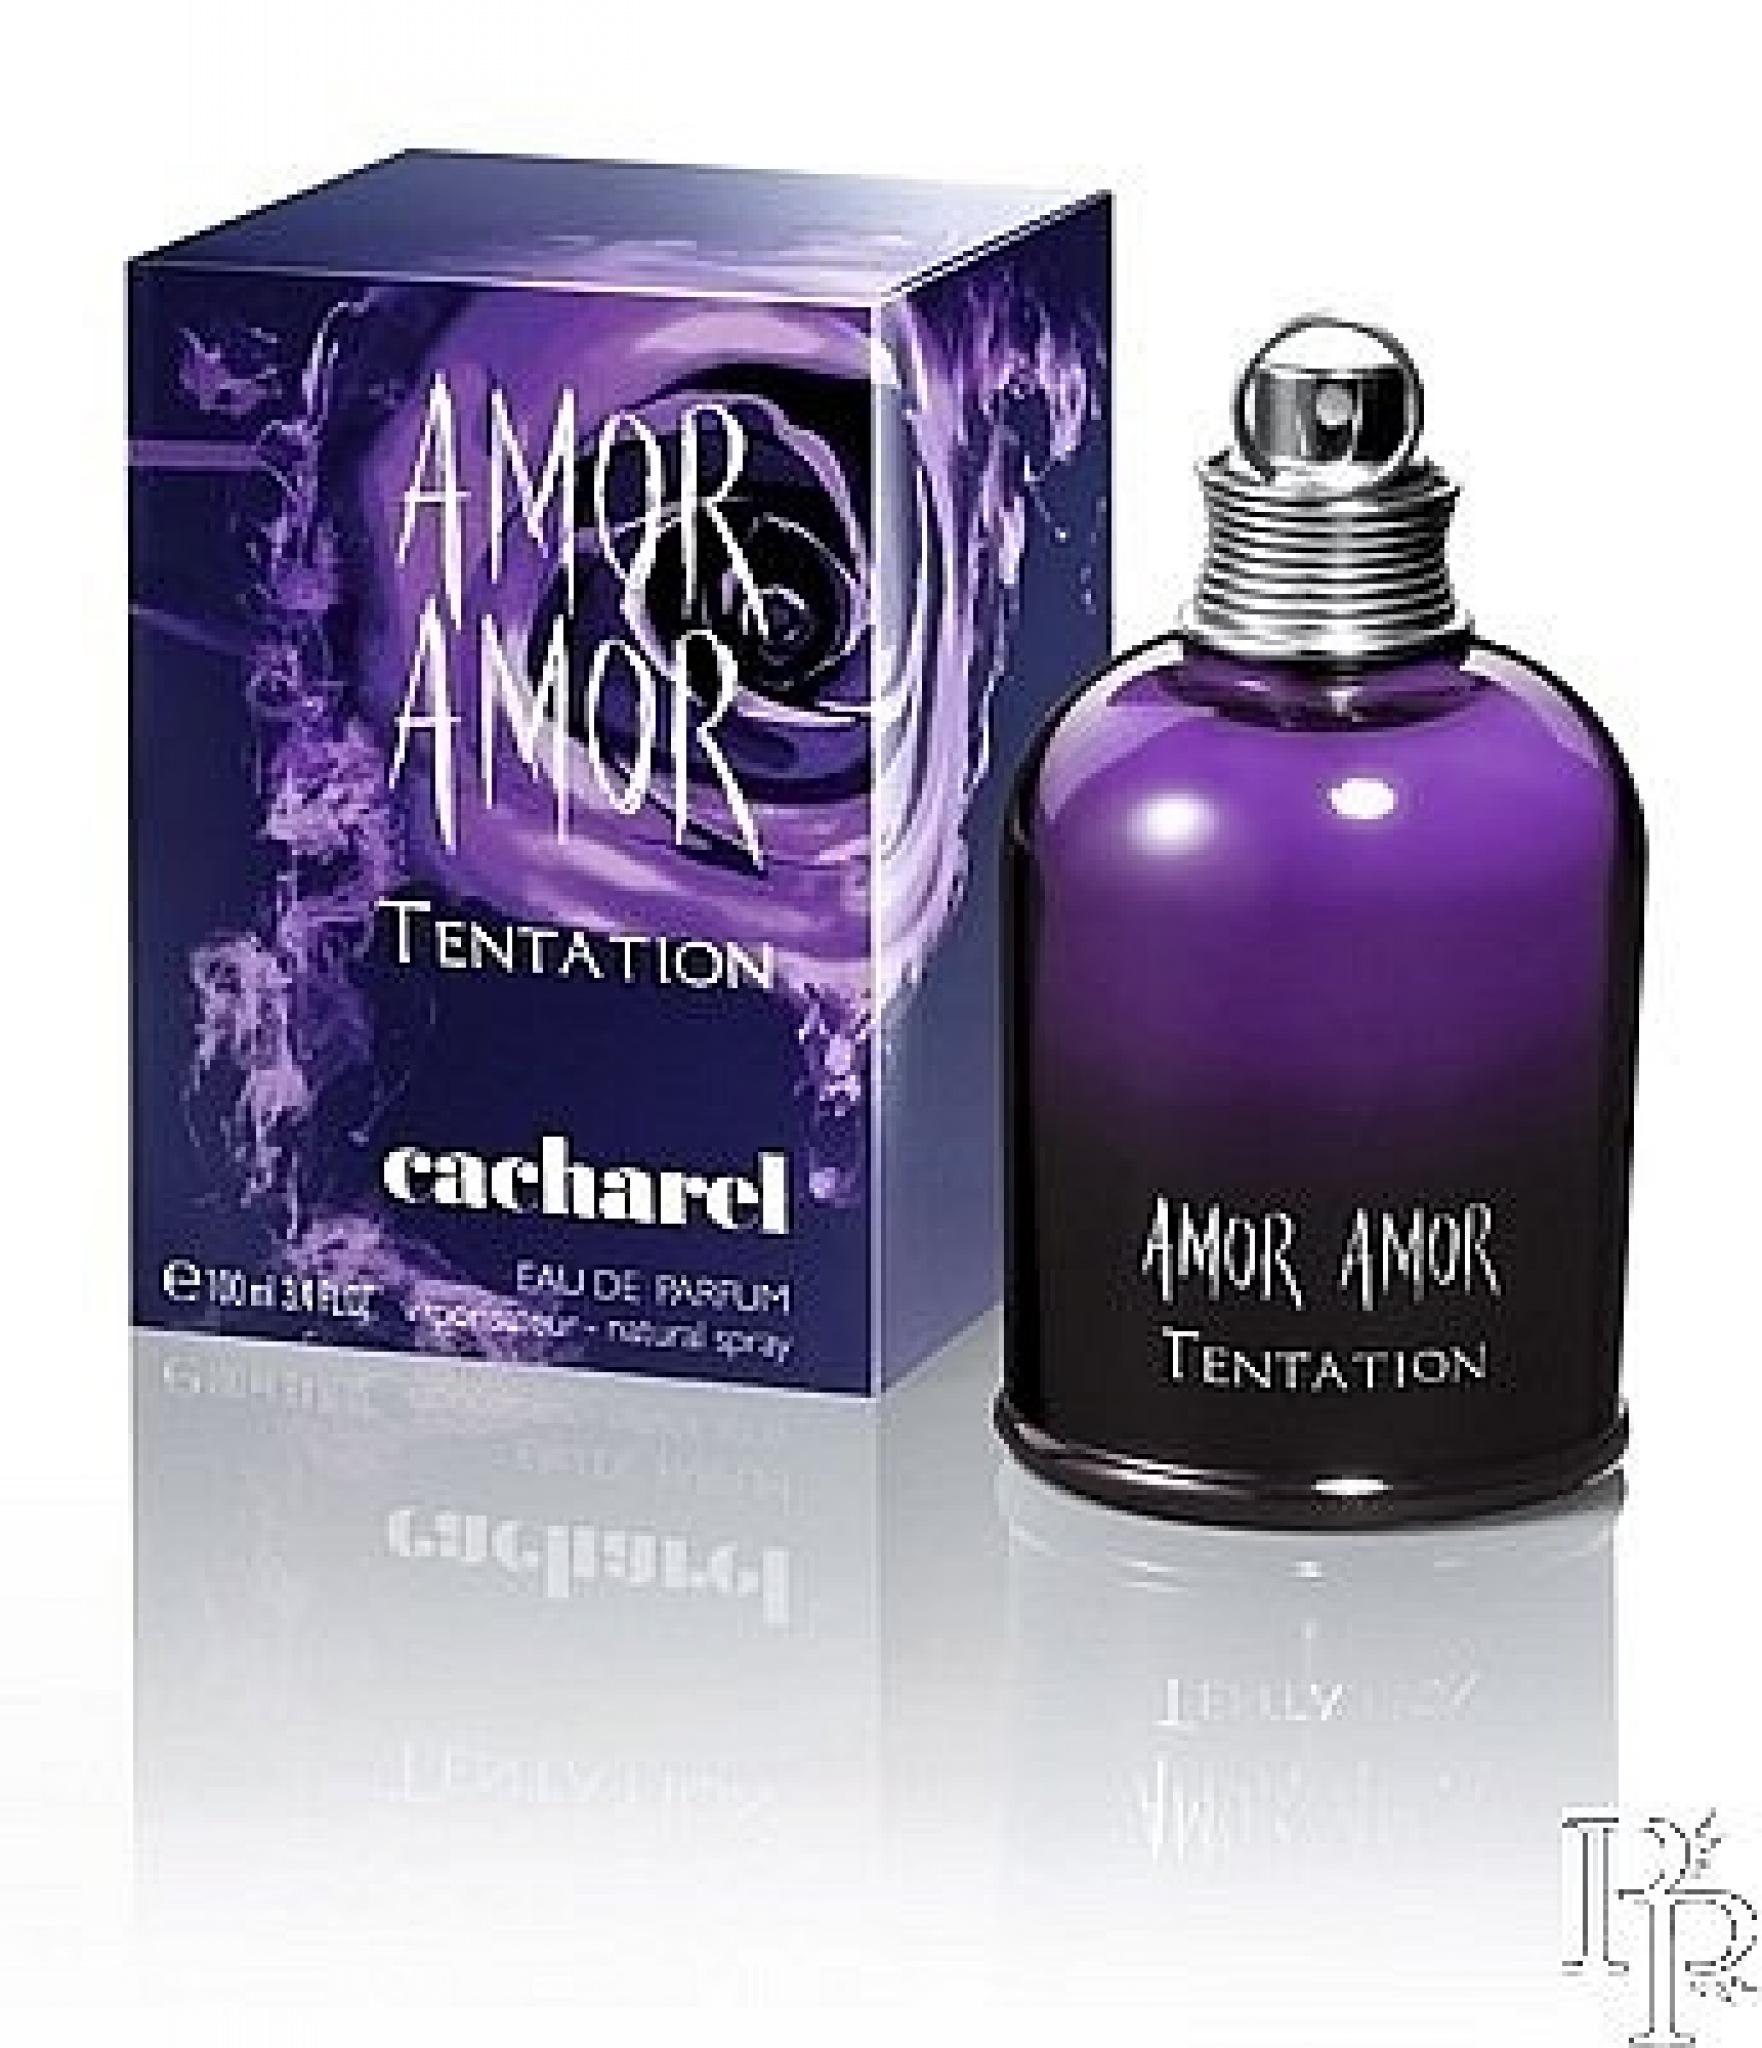 Cacharel - amor amor tentation. w-100.